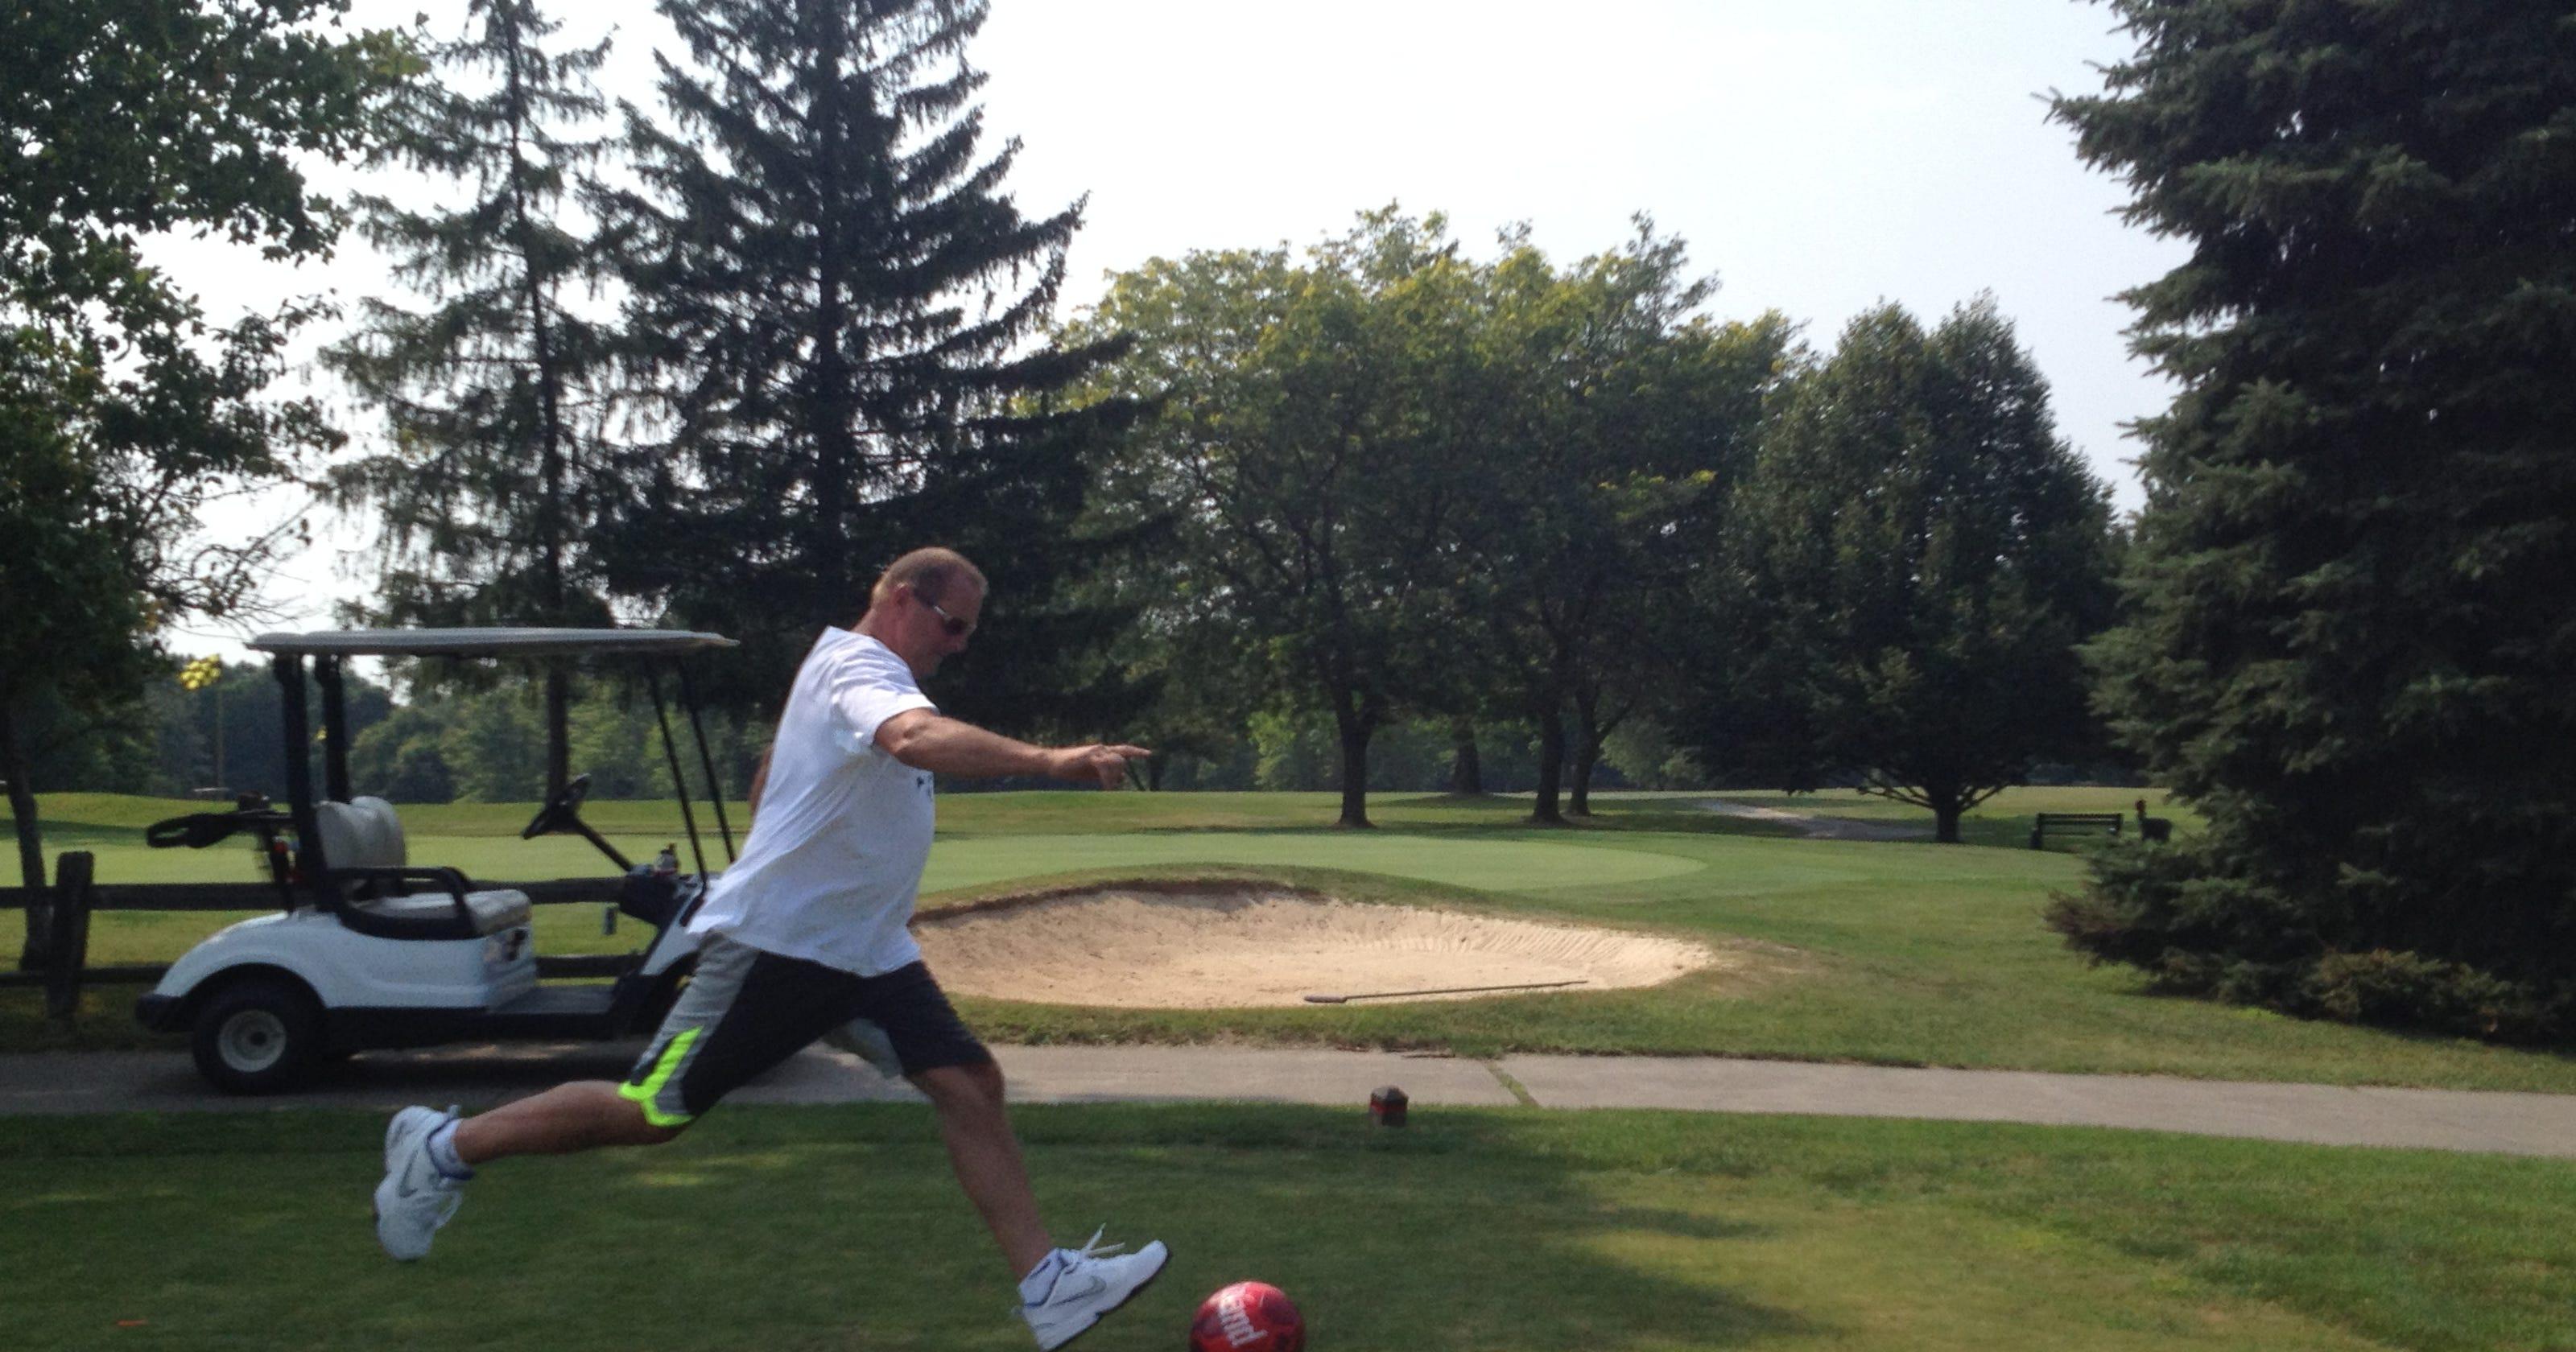 FootGolf uses soccer ball, kicks